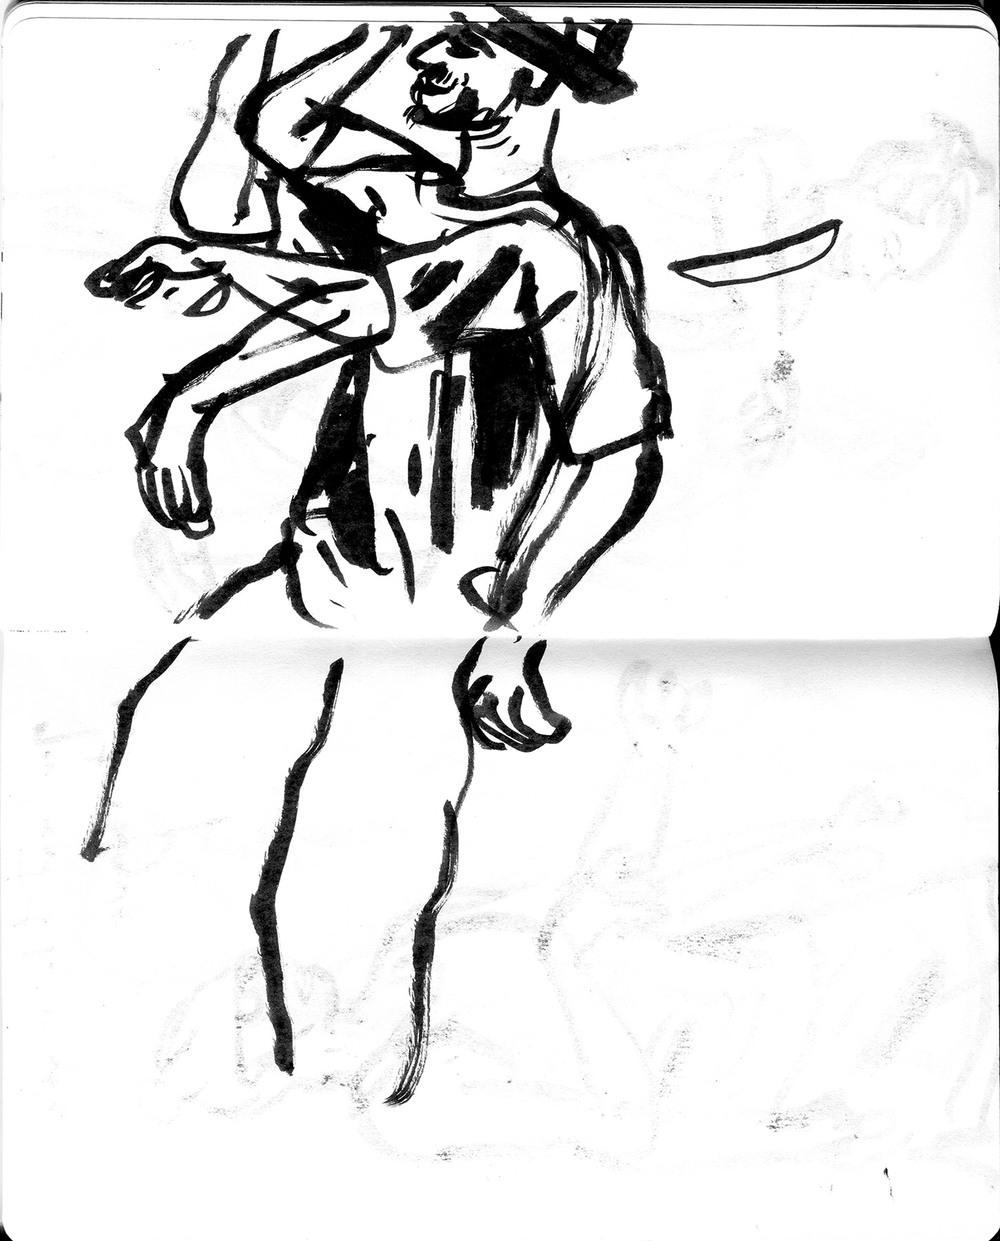 davidm_sketches_2016_08-023.jpg